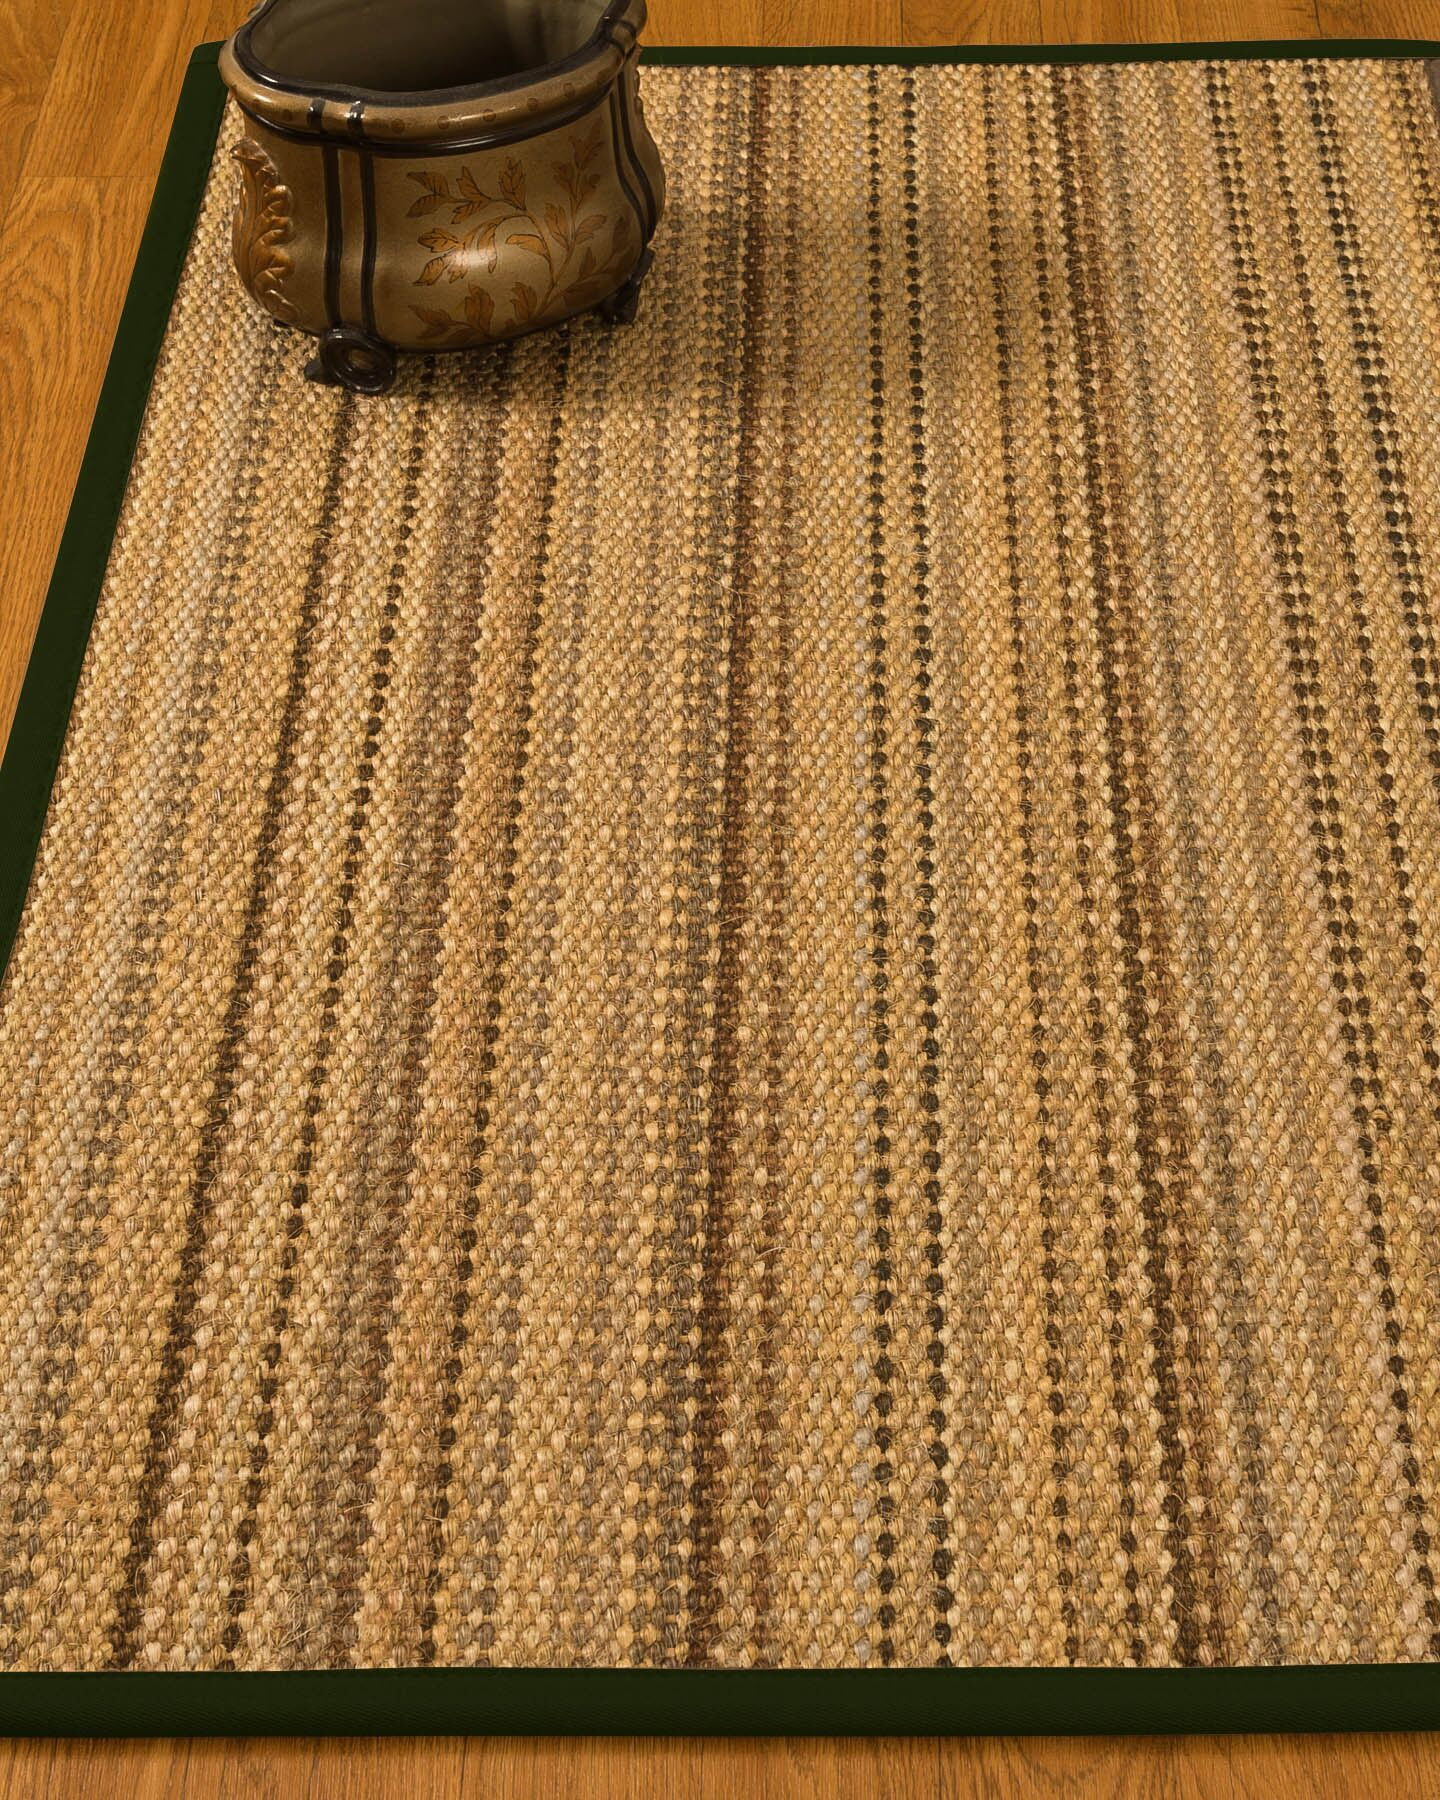 Kimmel Hand-Woven Beige Area Rug Rug Size: Rectangle 5' x 8'